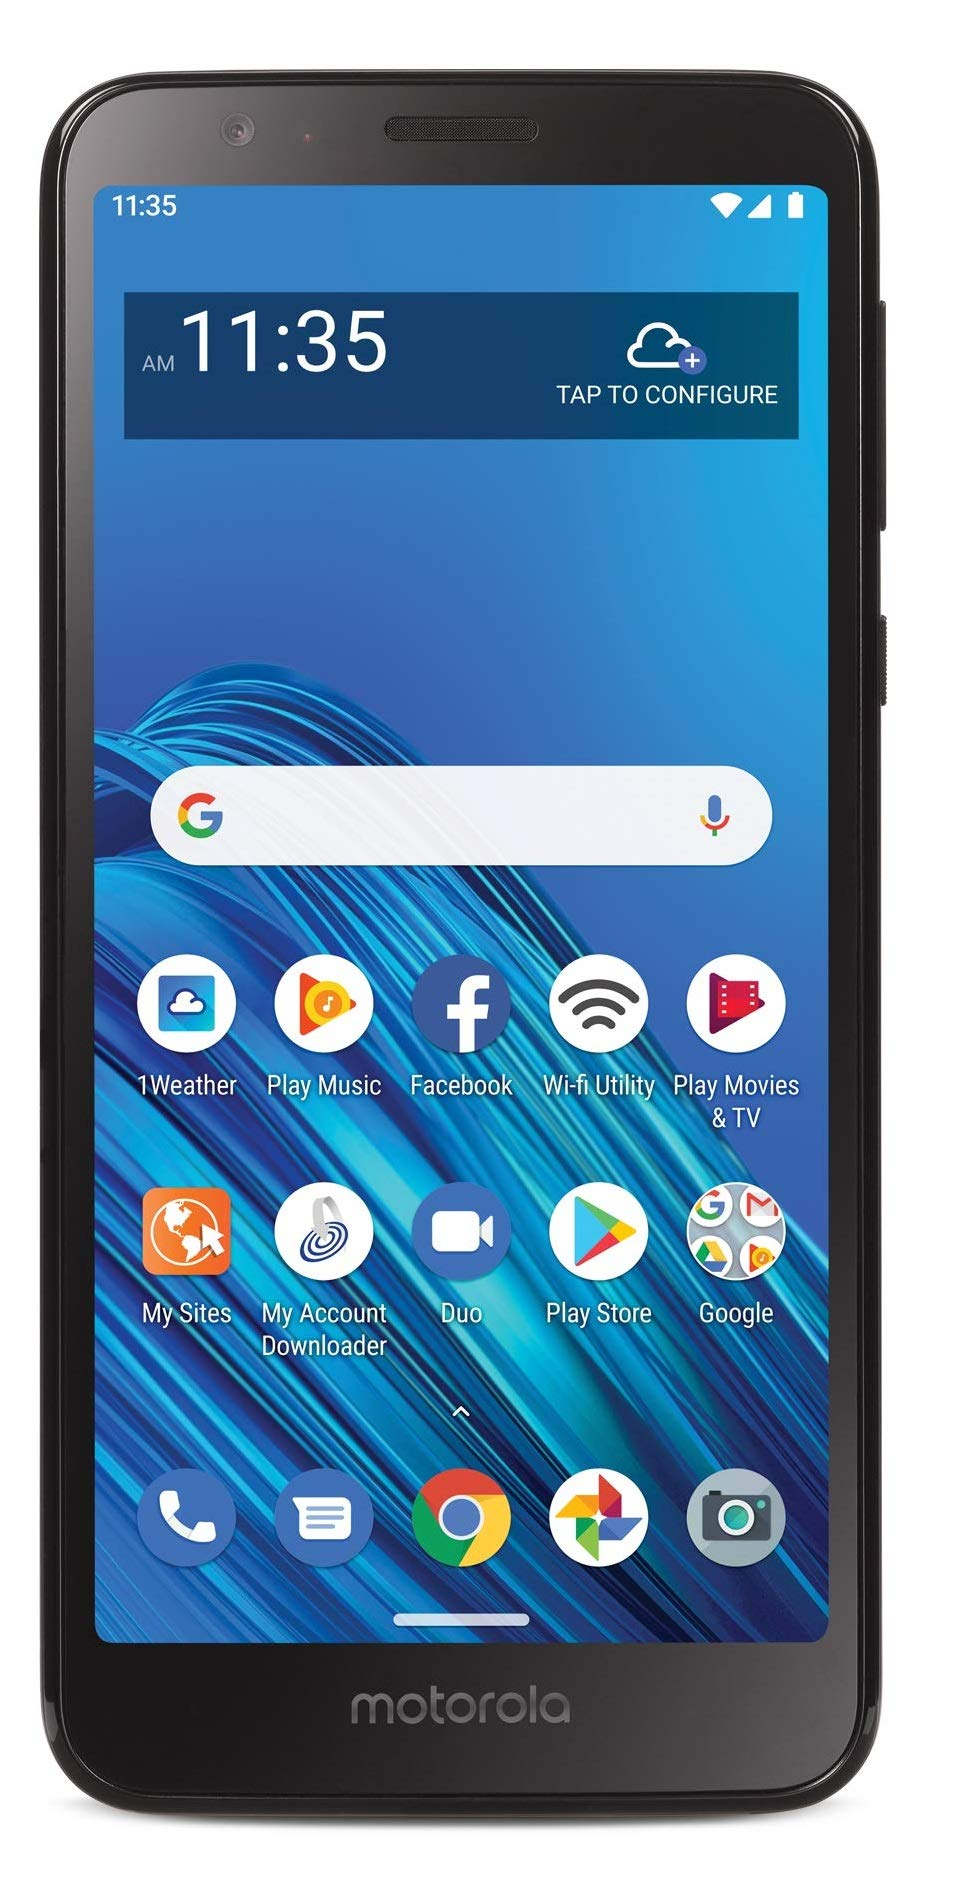 Net10 Motorola Moto E6 4G LTE Prepaid Smartphone (Locked) - Black - 16GB - Sim Card Included - CDMA